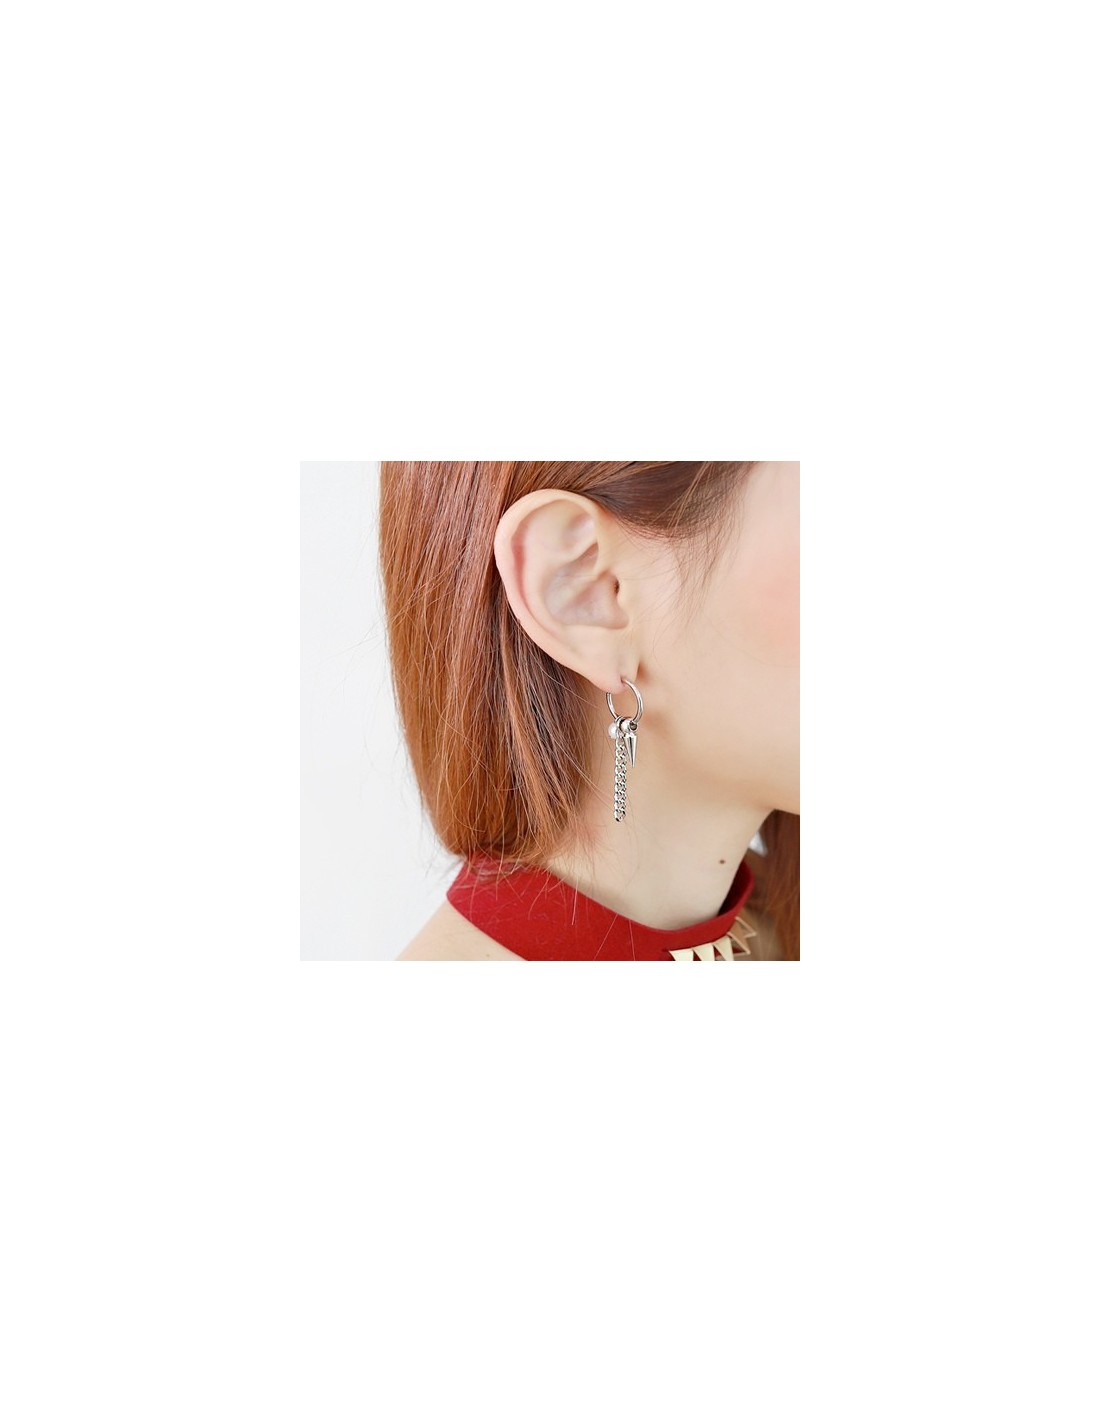 038659539 BB122] GD G-Dragon Style Heint Piercing & Non Piercing